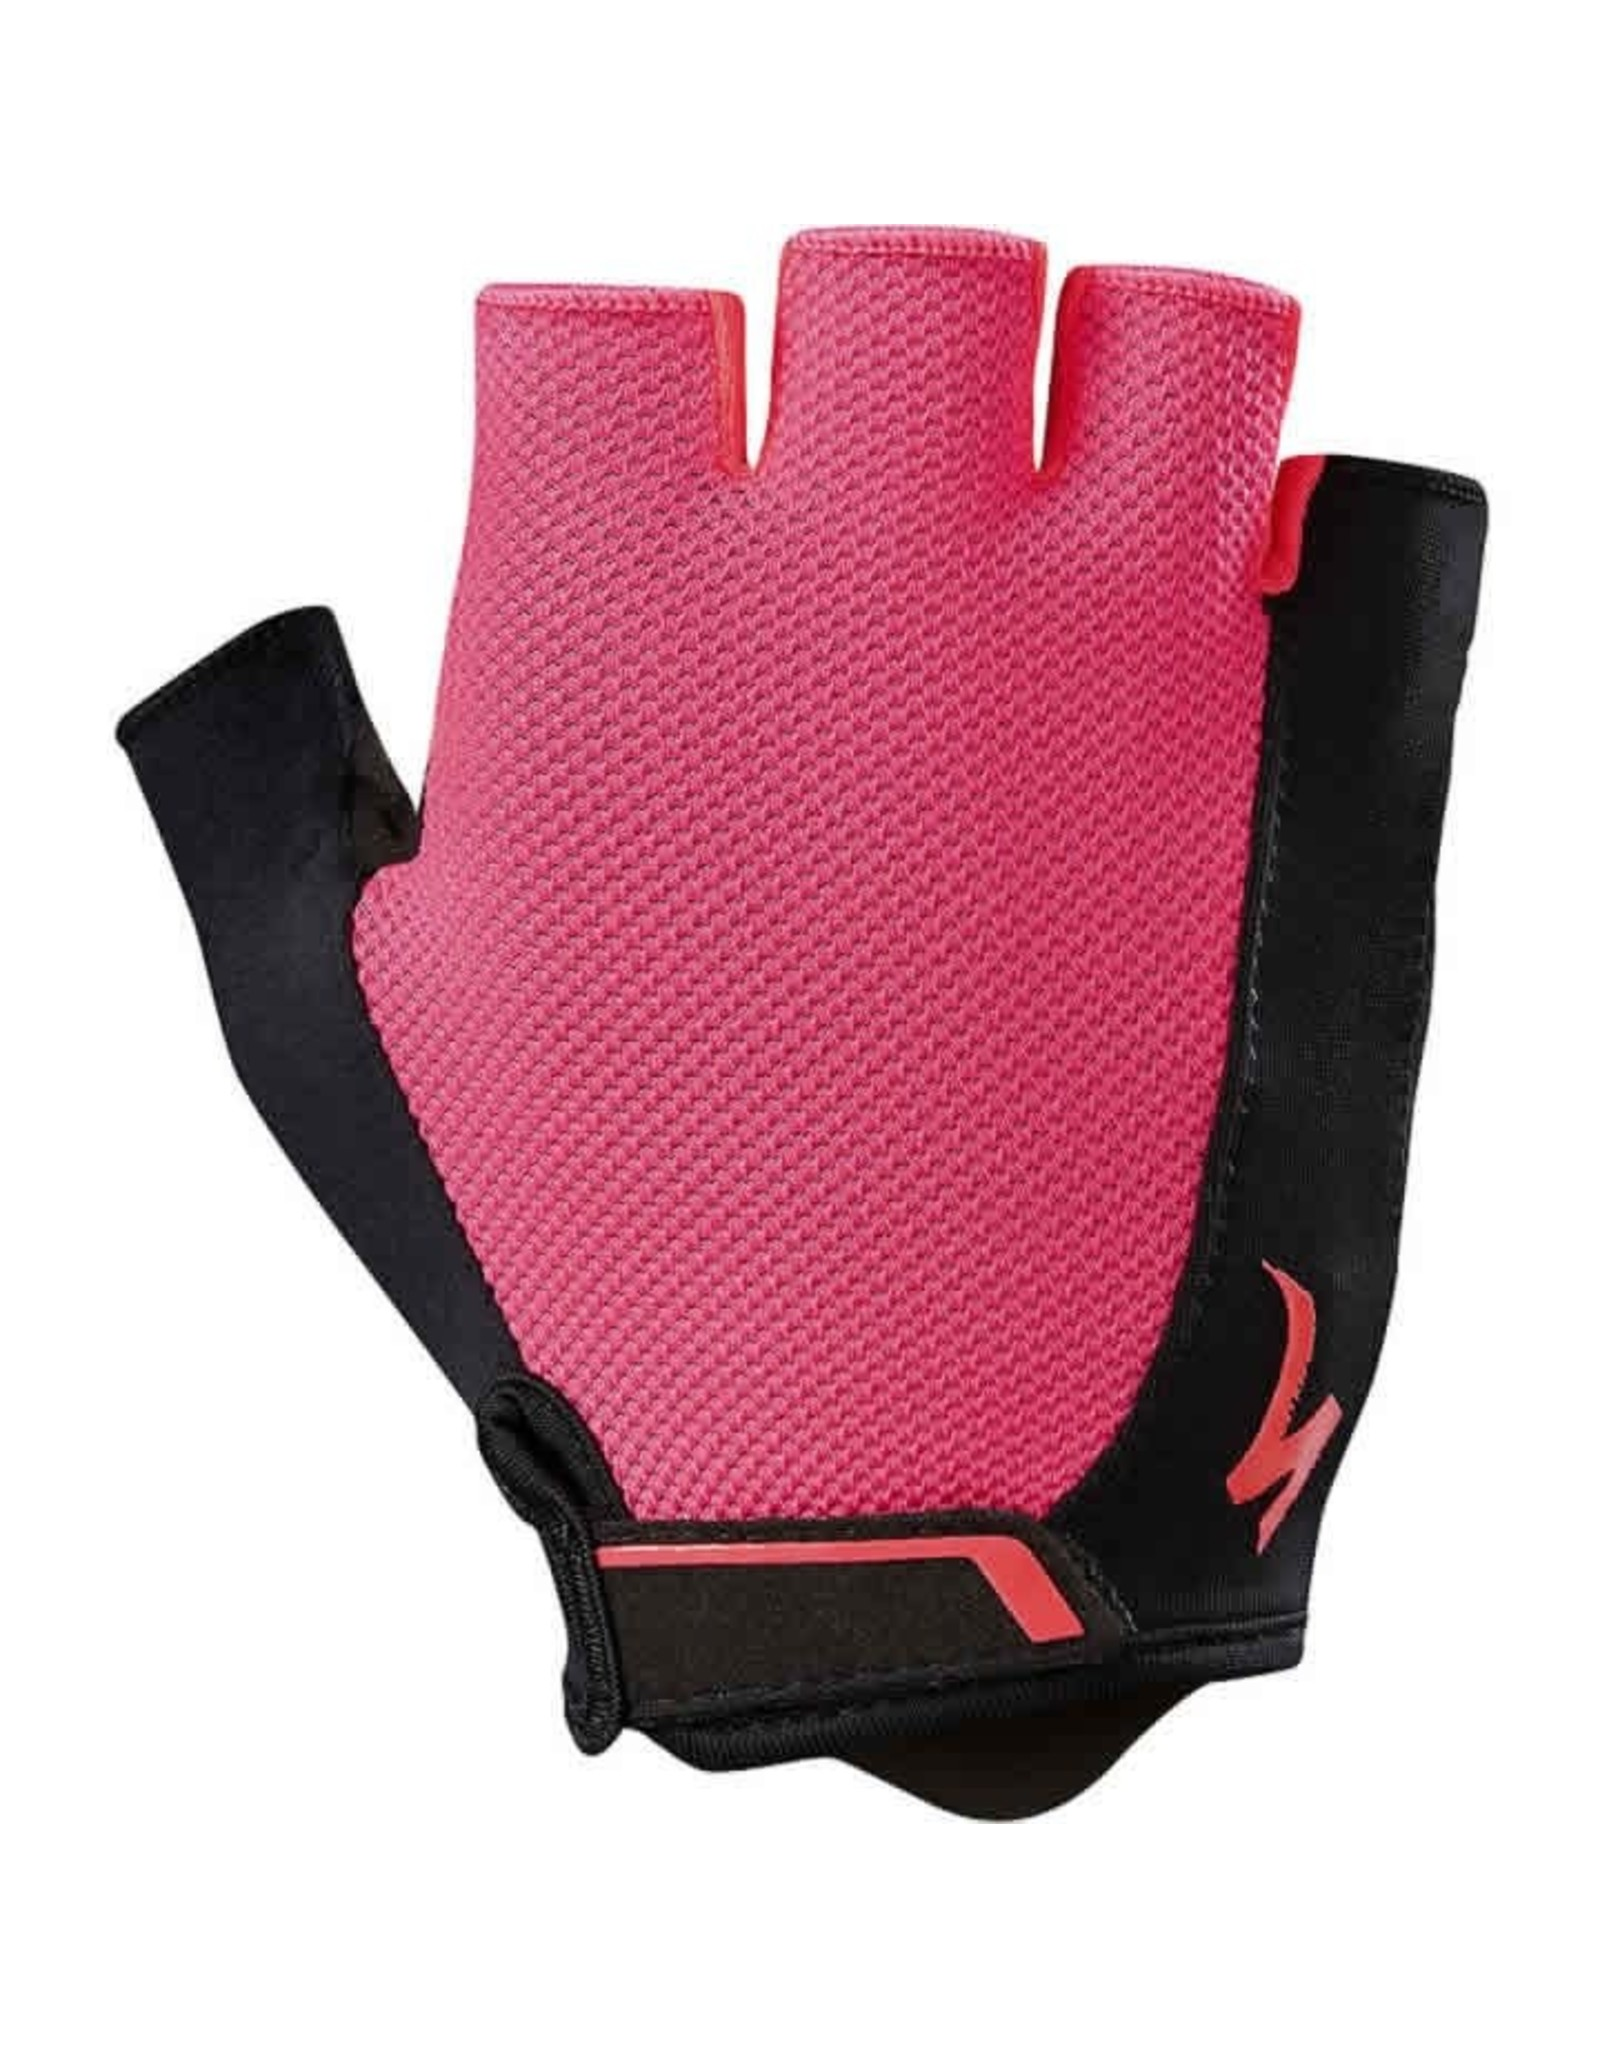 Specialized Glove Spec BG Sport  Wmn Wht/Pnk S